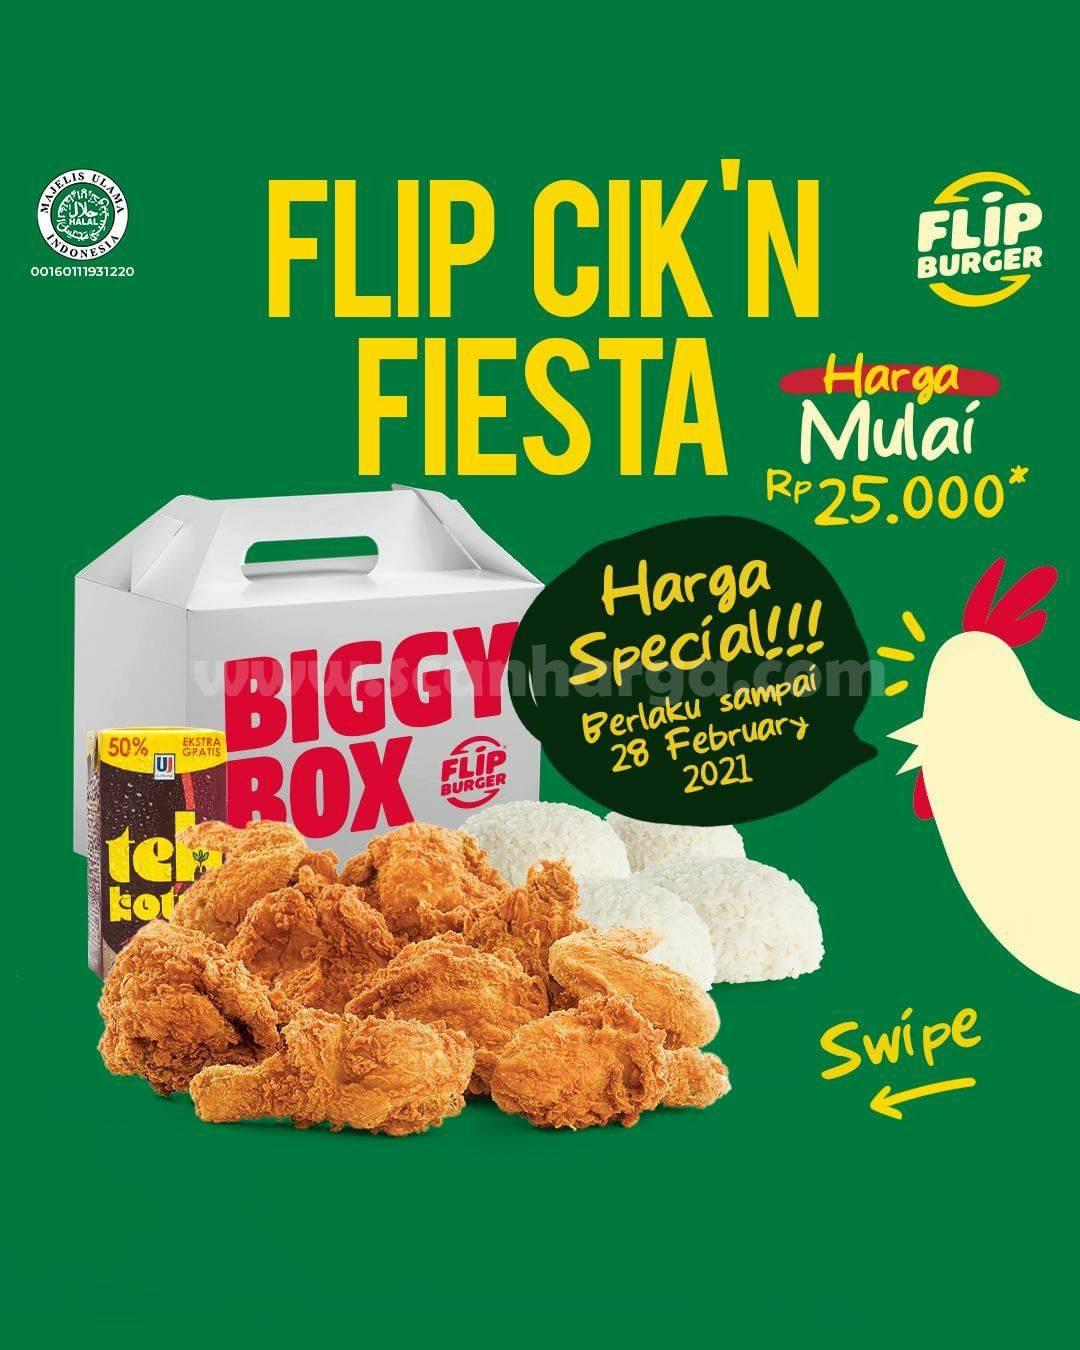 FLIP BURGER PAKET FLIP CIK'N FIESTA – Harga Promo mulai Rp. 25.000